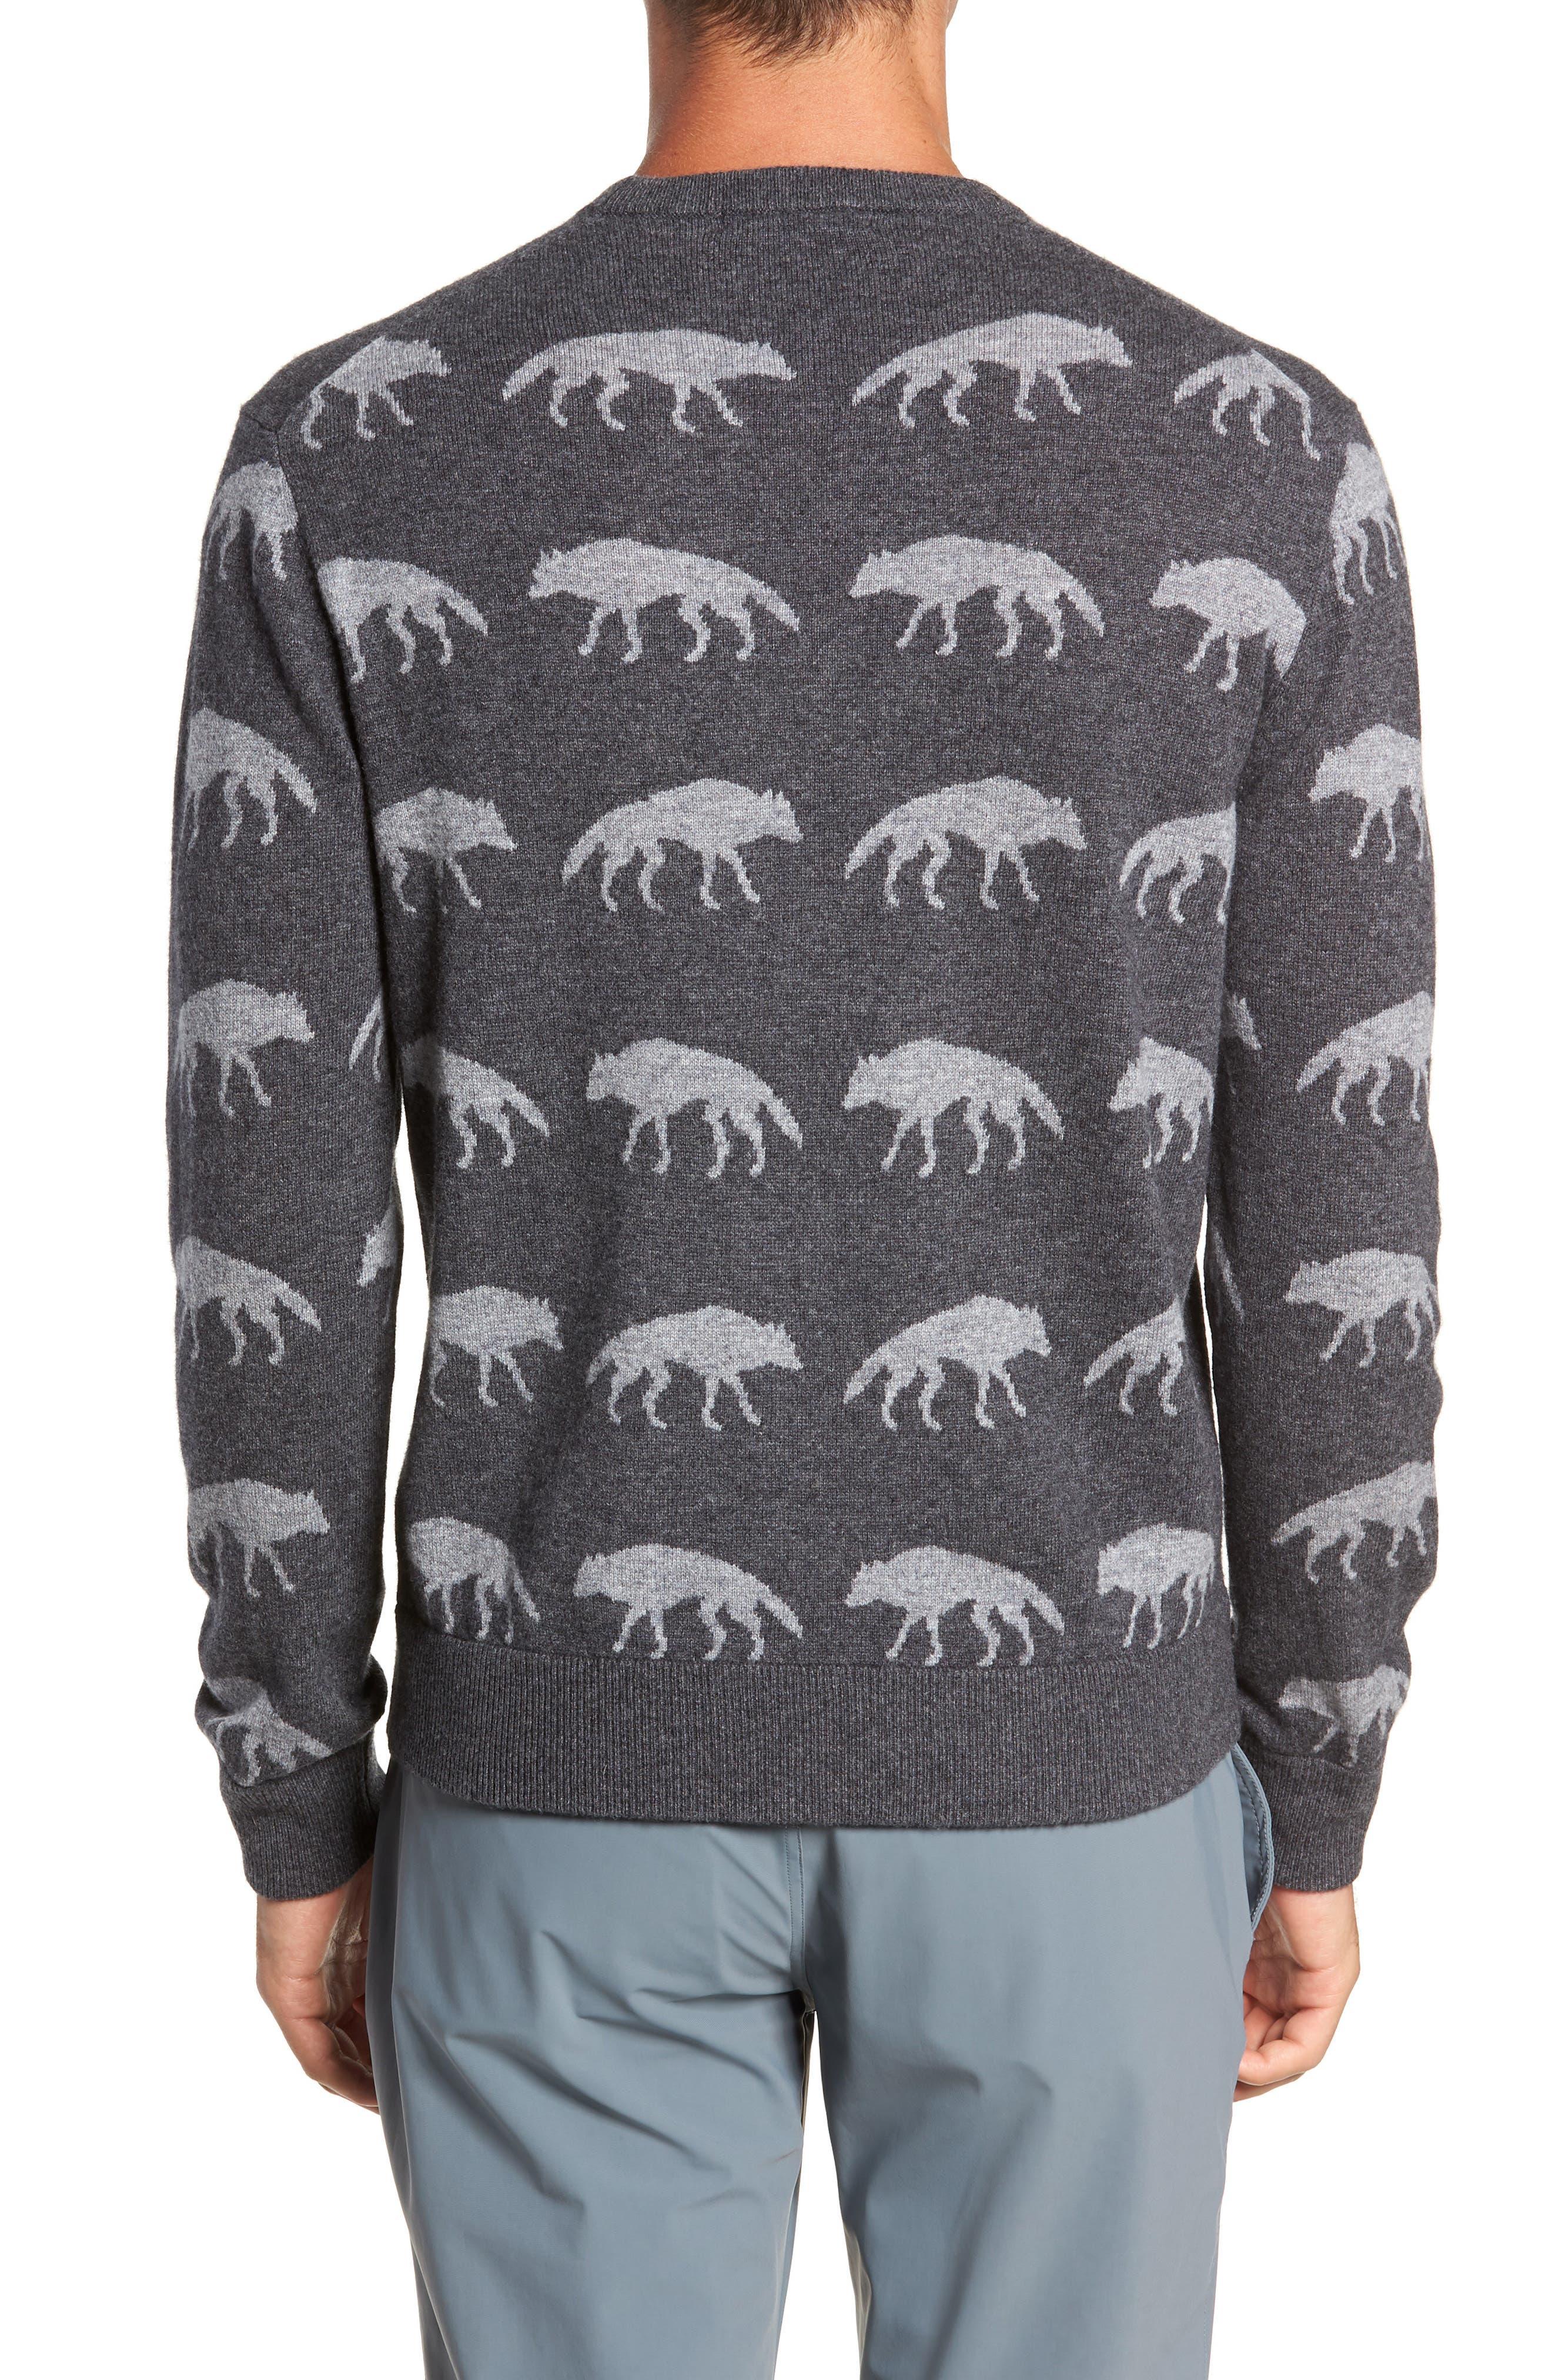 Alphawolf Intarsia Crewneck Sweater,                             Alternate thumbnail 2, color,                             GREY HEATHER